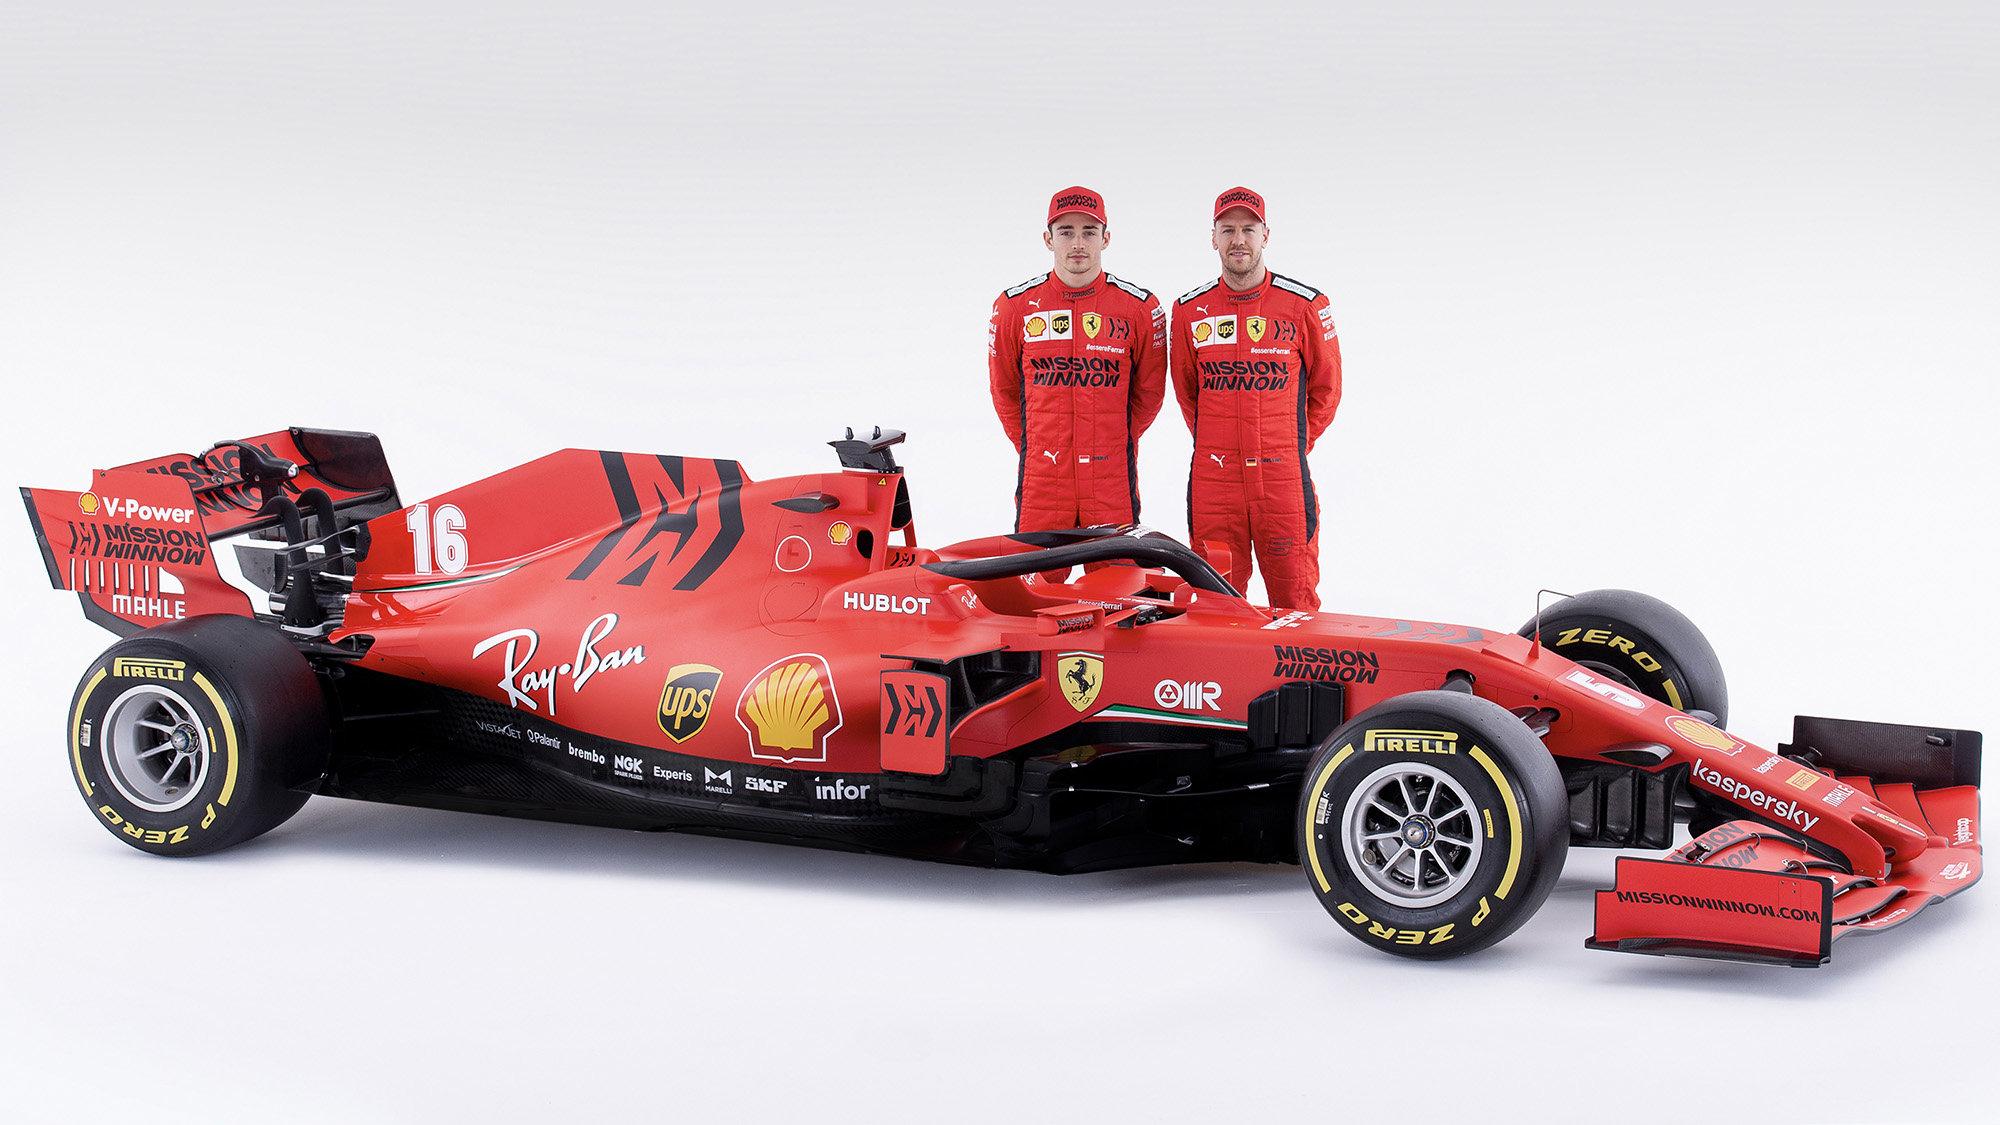 Charles Leclerc, Sebastian Vettel a nový vůz SF1000